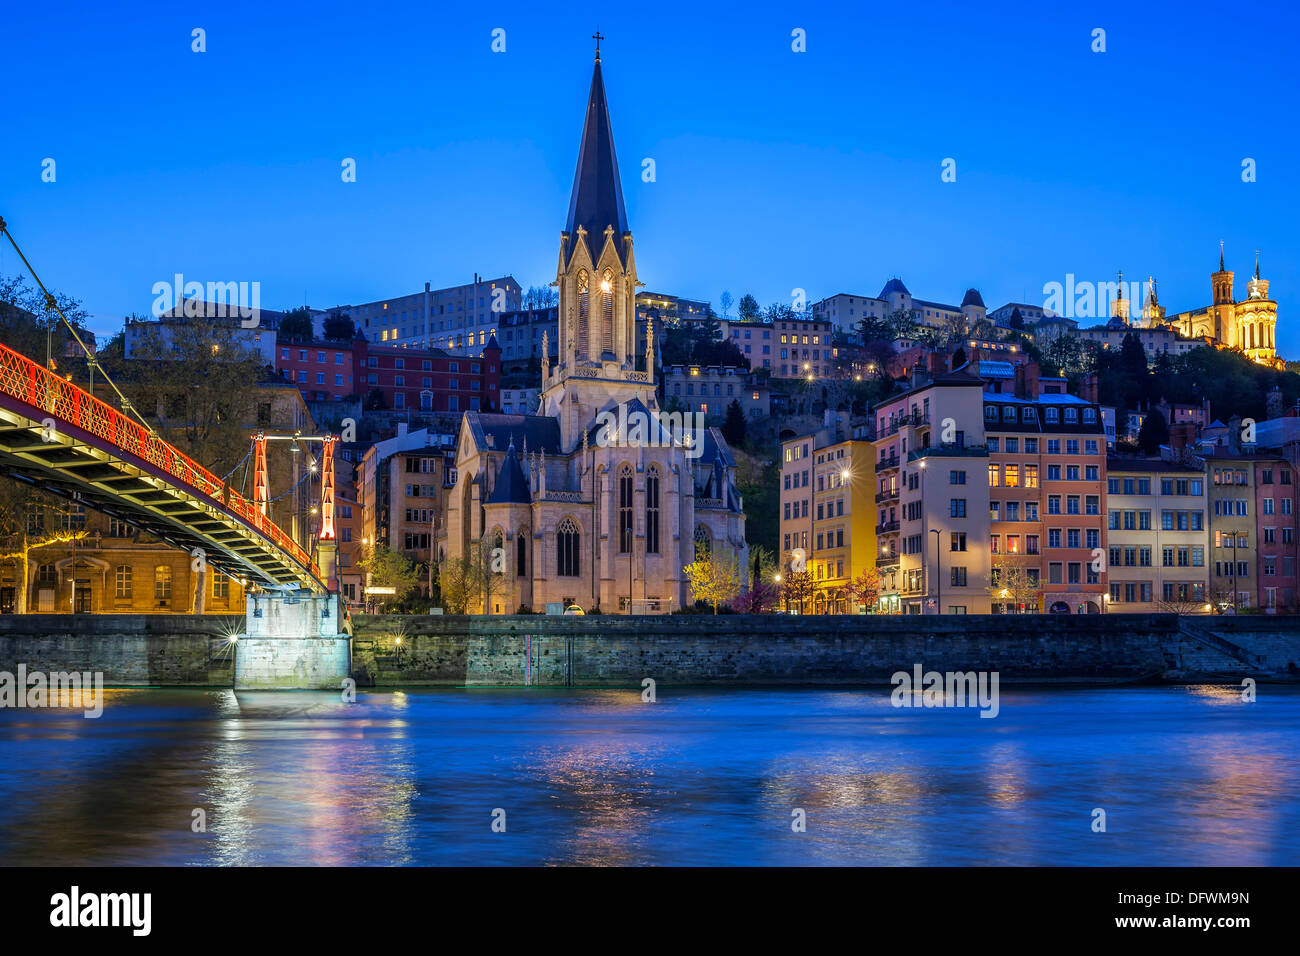 Berühmte Kirche in Lyon mit Saône in der Nacht Stockbild